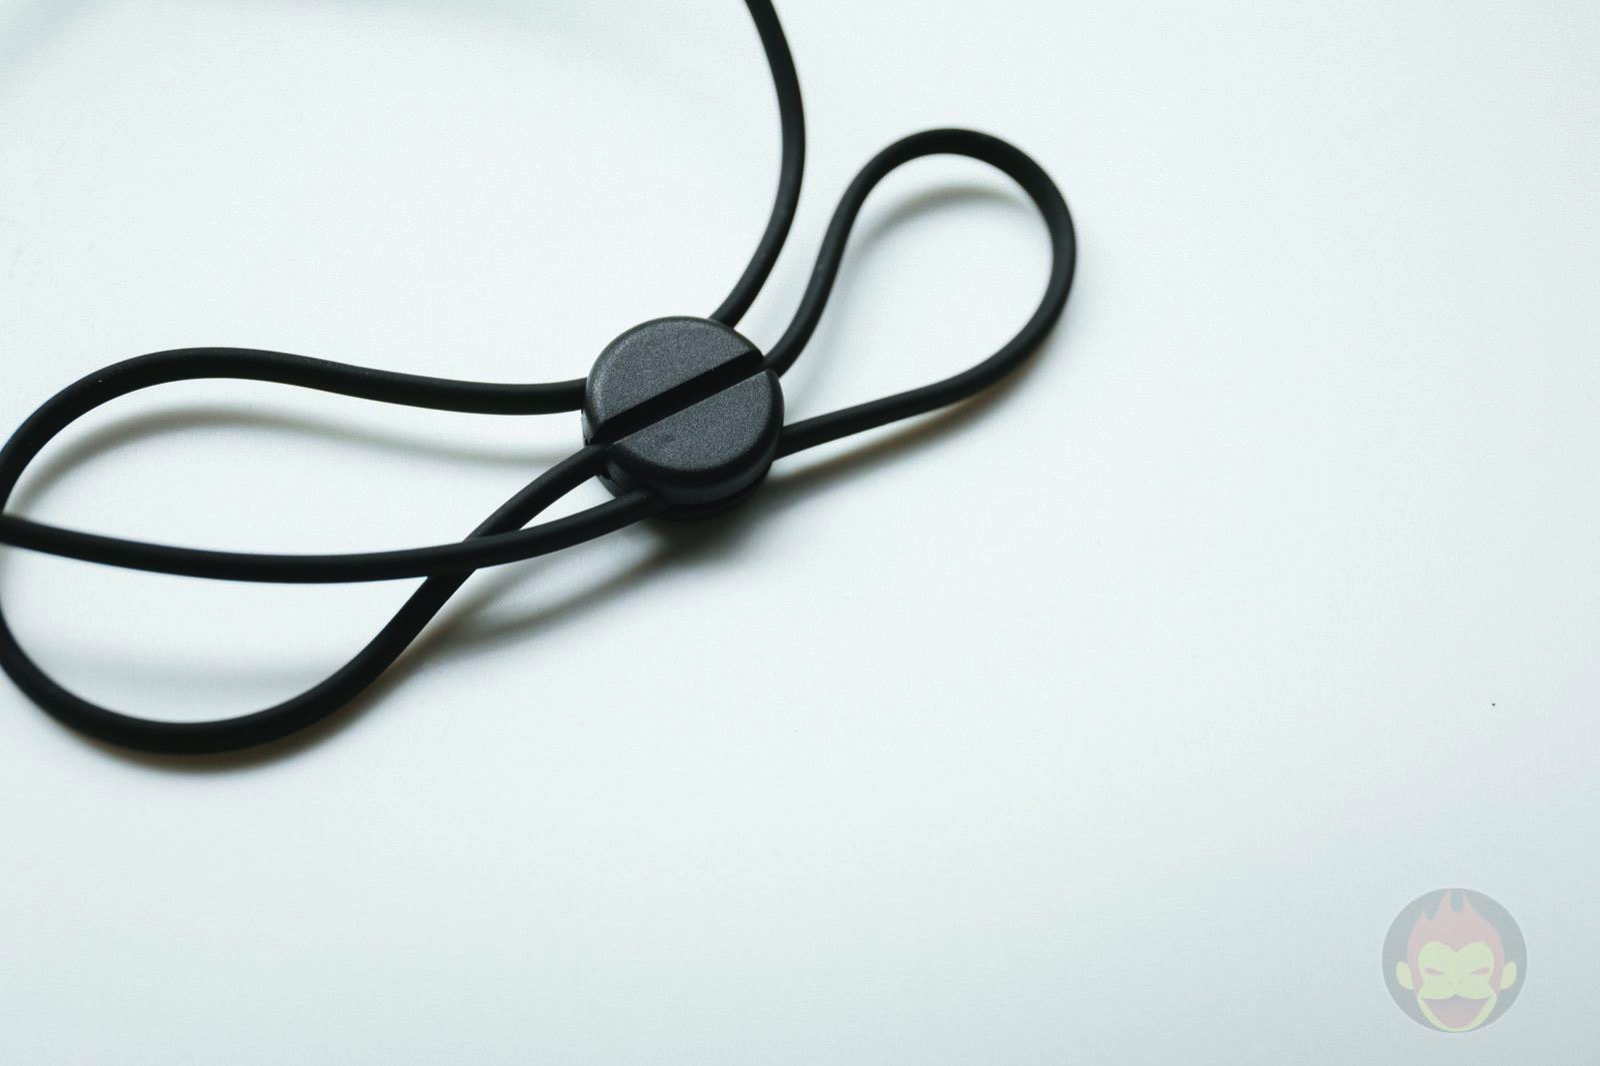 Anker Soundcore Spirit Sweatguard earphones 07